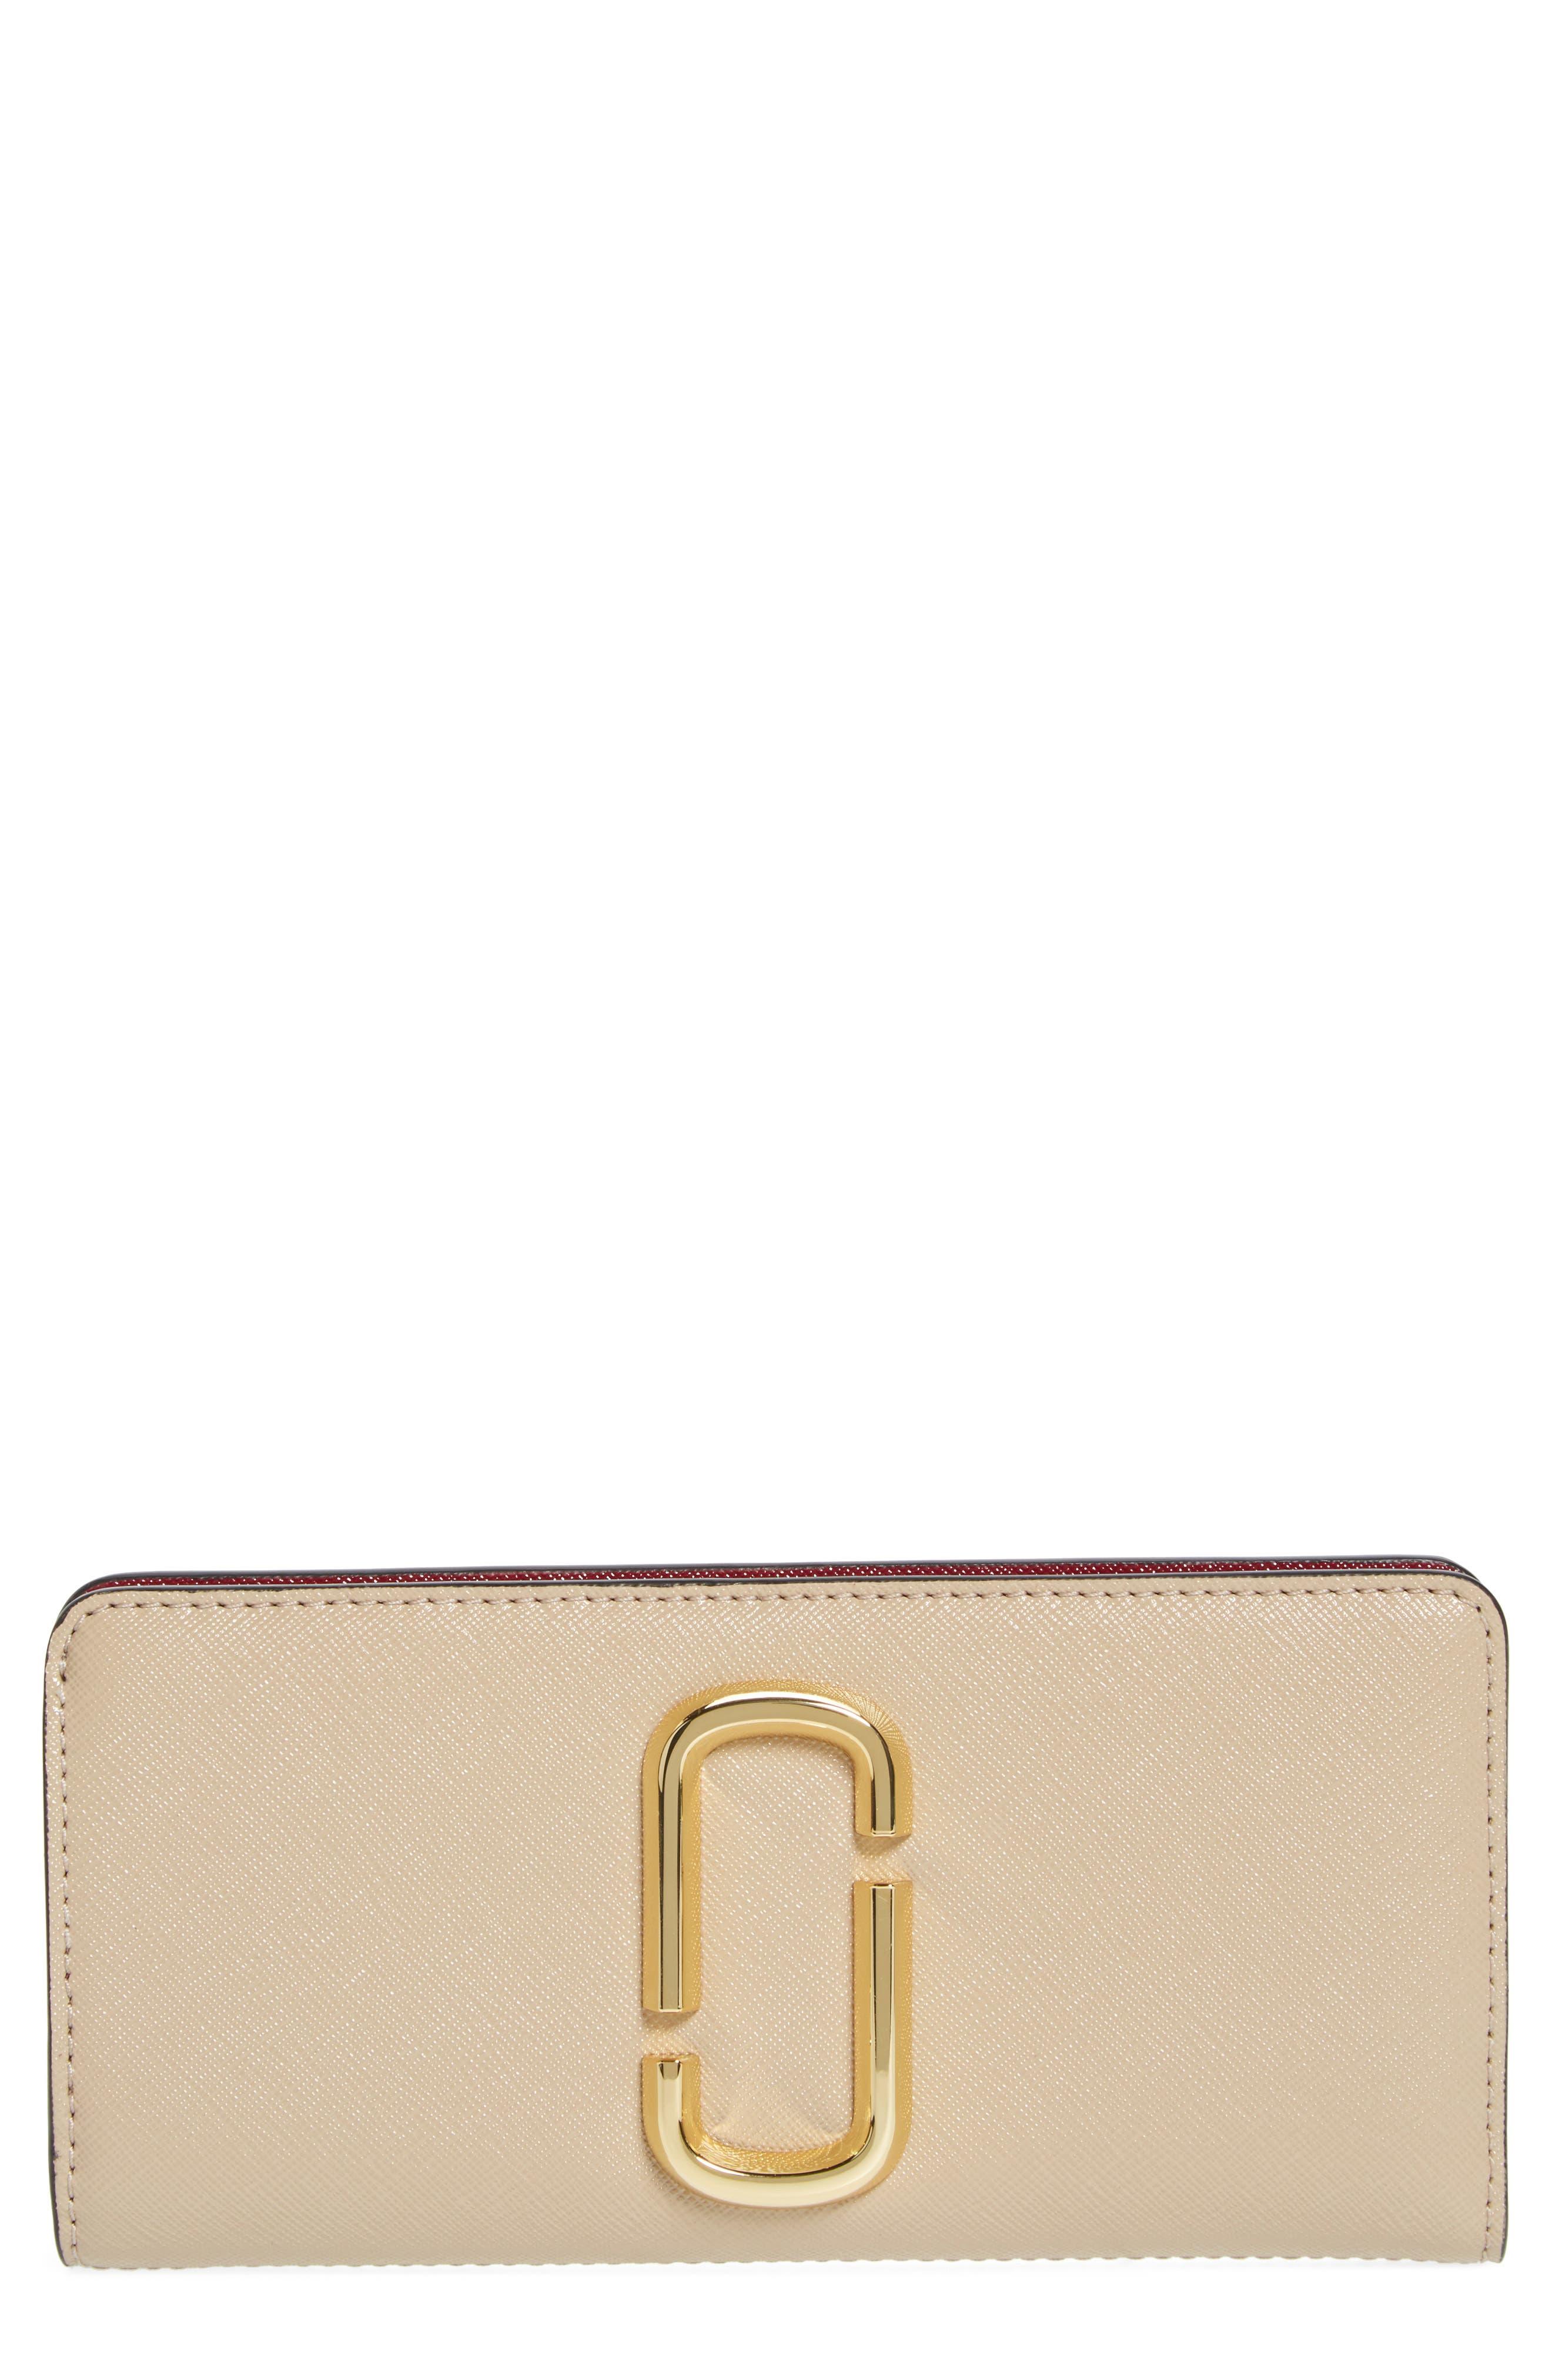 Snapshot Open Face Leather Wallet,                             Main thumbnail 1, color,                             Light Slate Multi